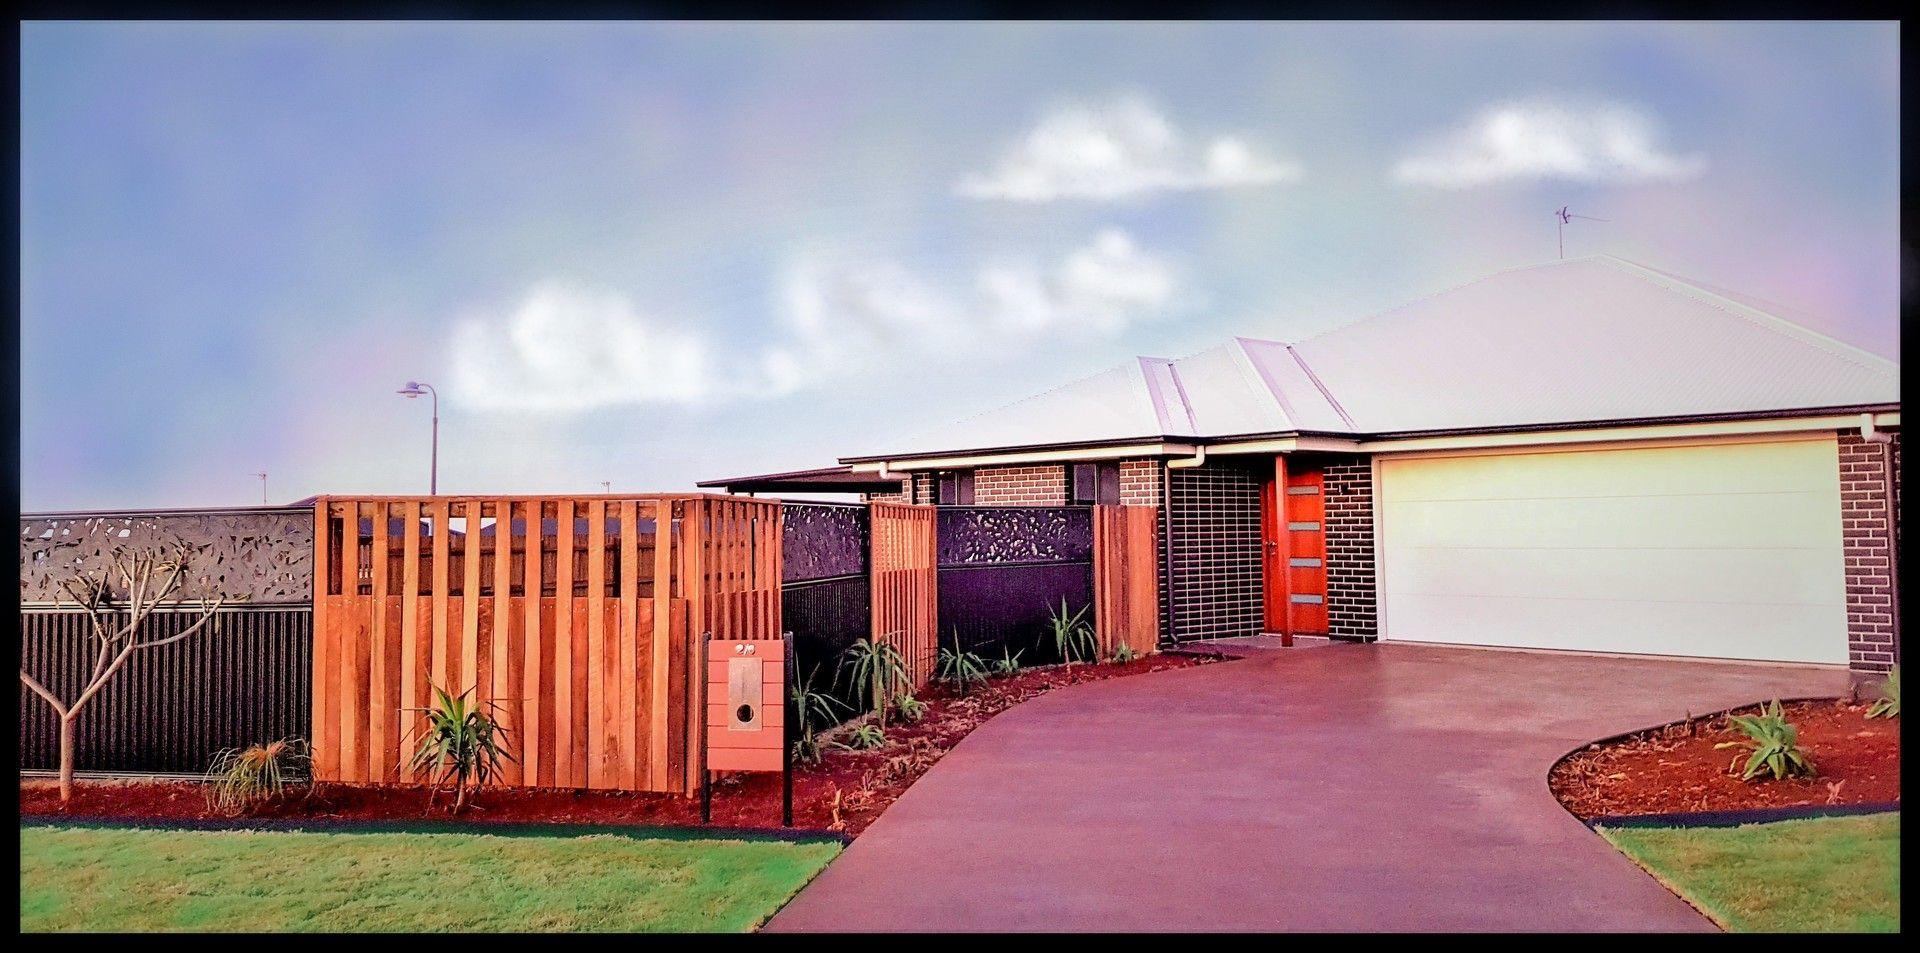 2//6 Farrer Street, Cranley QLD 4350, Image 0